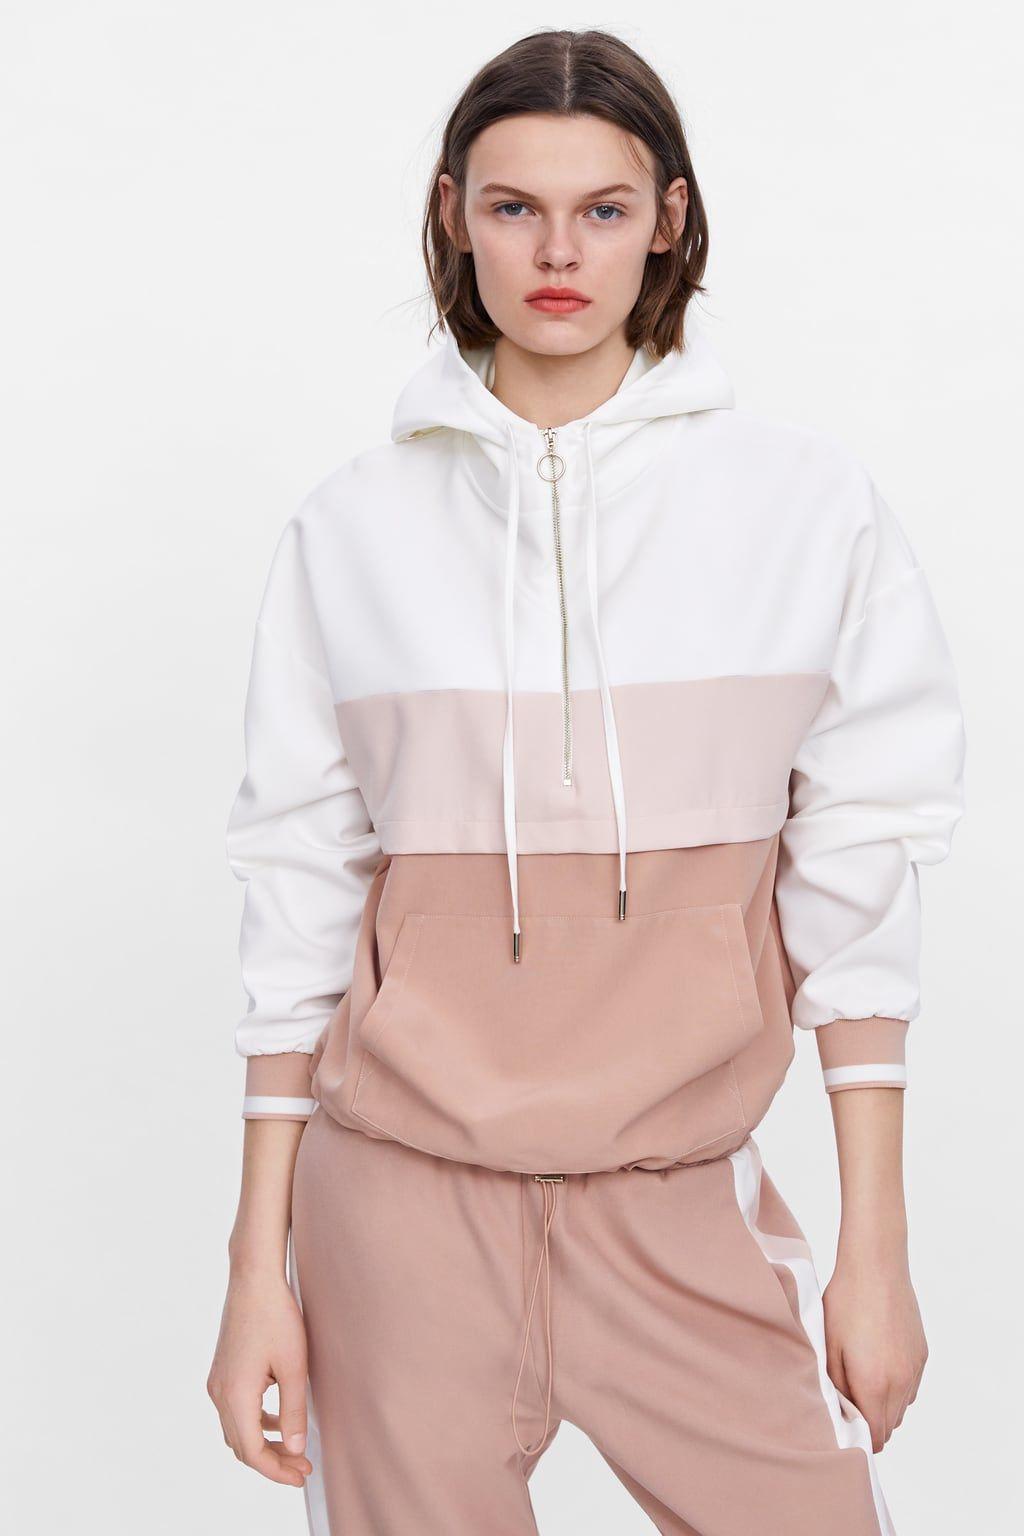 5b836359 Jogging jacket with pouch pocket in 2019   B U Y   Jackets ...